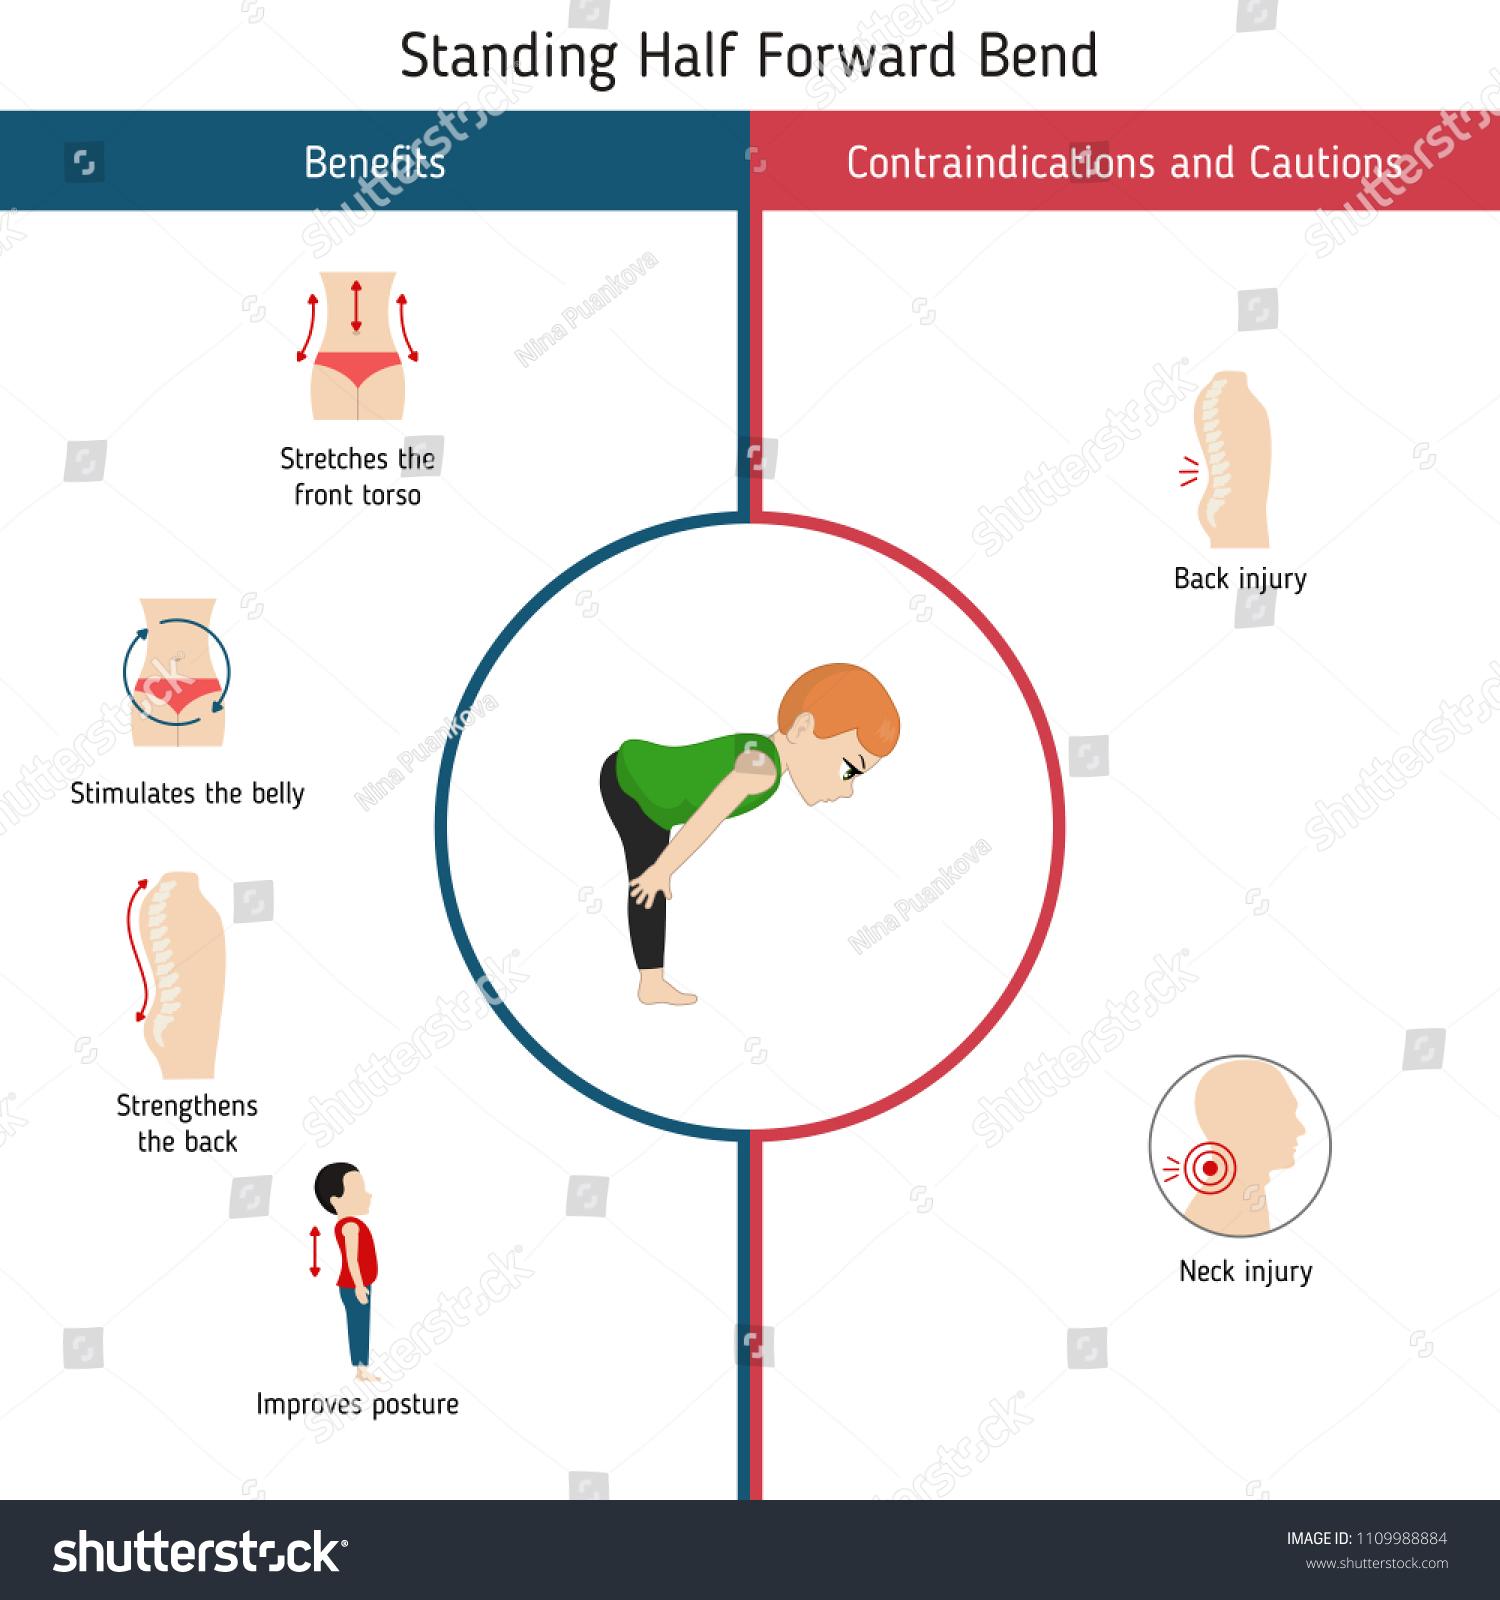 Running: benefits and contraindications 75